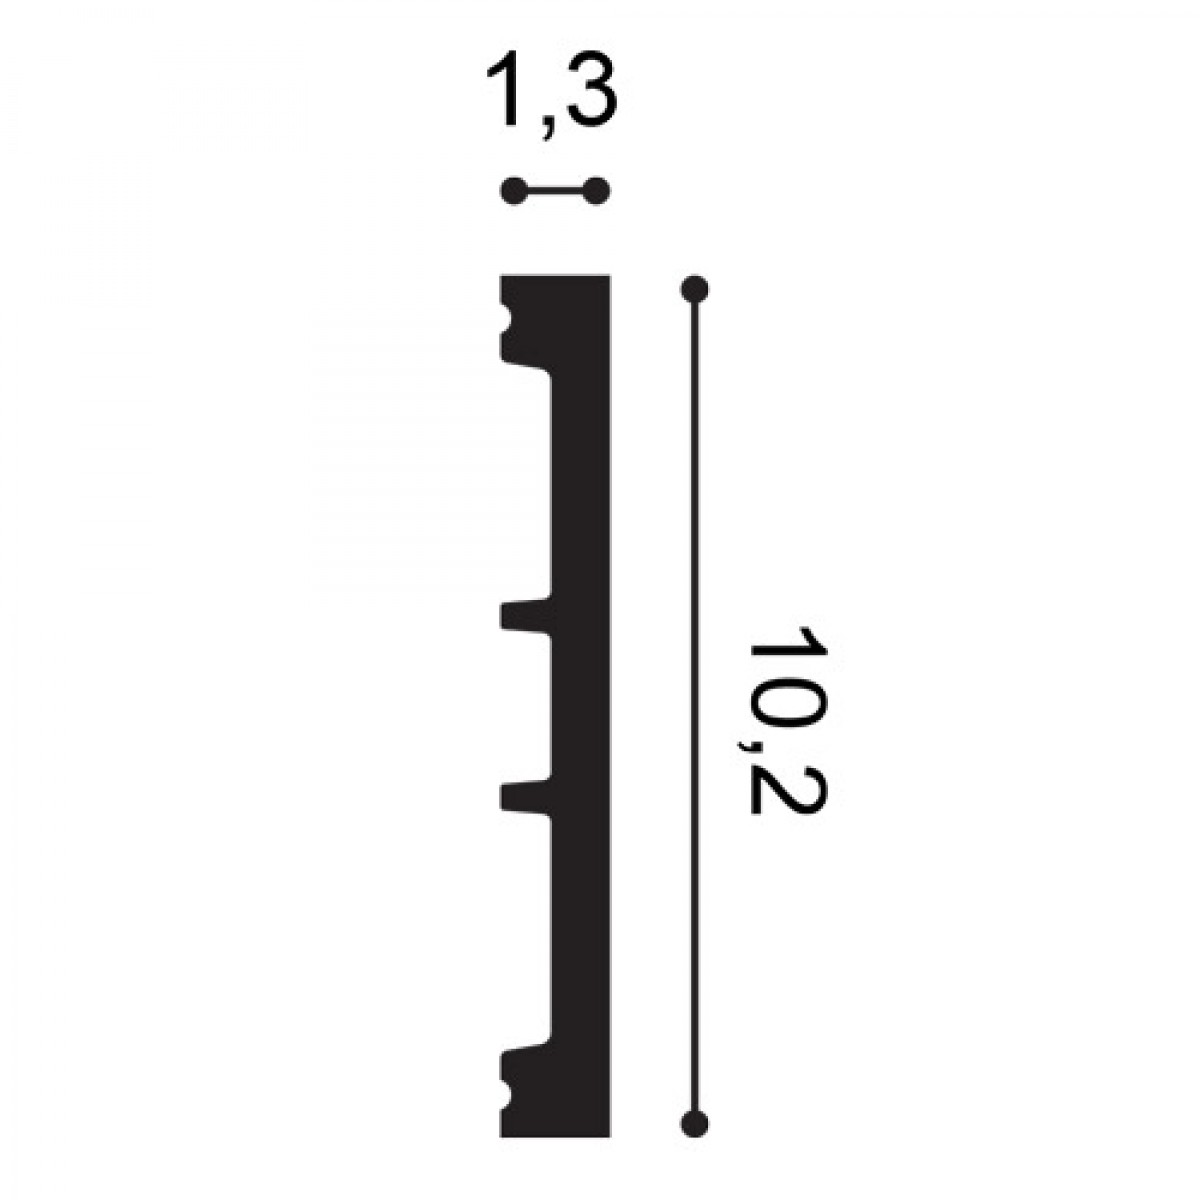 Plinta Flex Axxent SX163F, Dimensiuni: 200 X 1.3 X 10.2 cm, Orac Decor